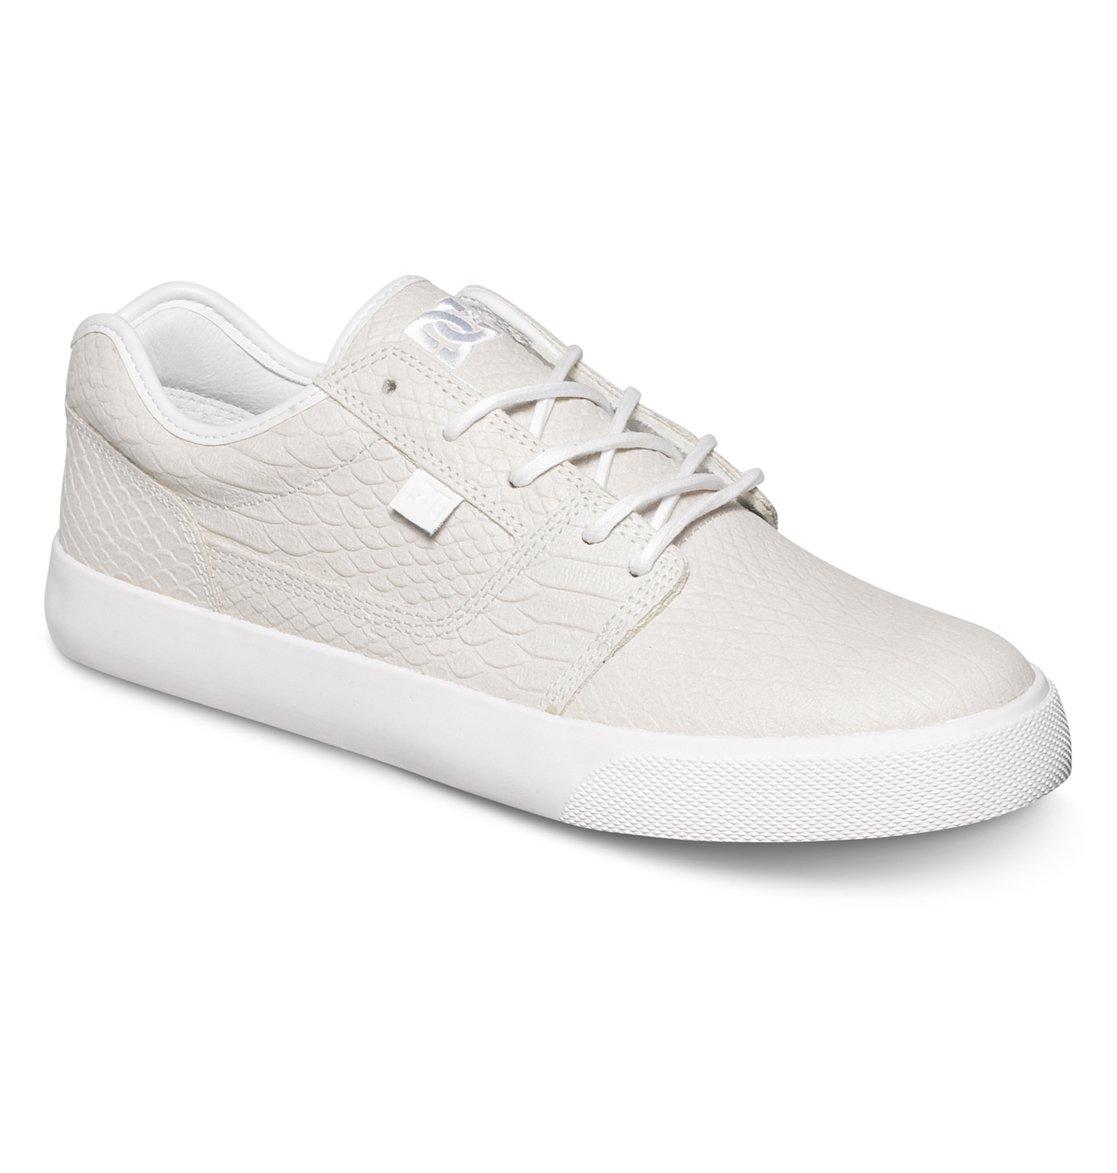 Tonik LX - Dcshoes������ ������� ���� Tonik LX �� DC Shoes � ������� �� ��������� ����� 2015. ��������������: ���� �� ����������� ���� Premium, ����������������� �����������, ������� ���������������� ������.<br>